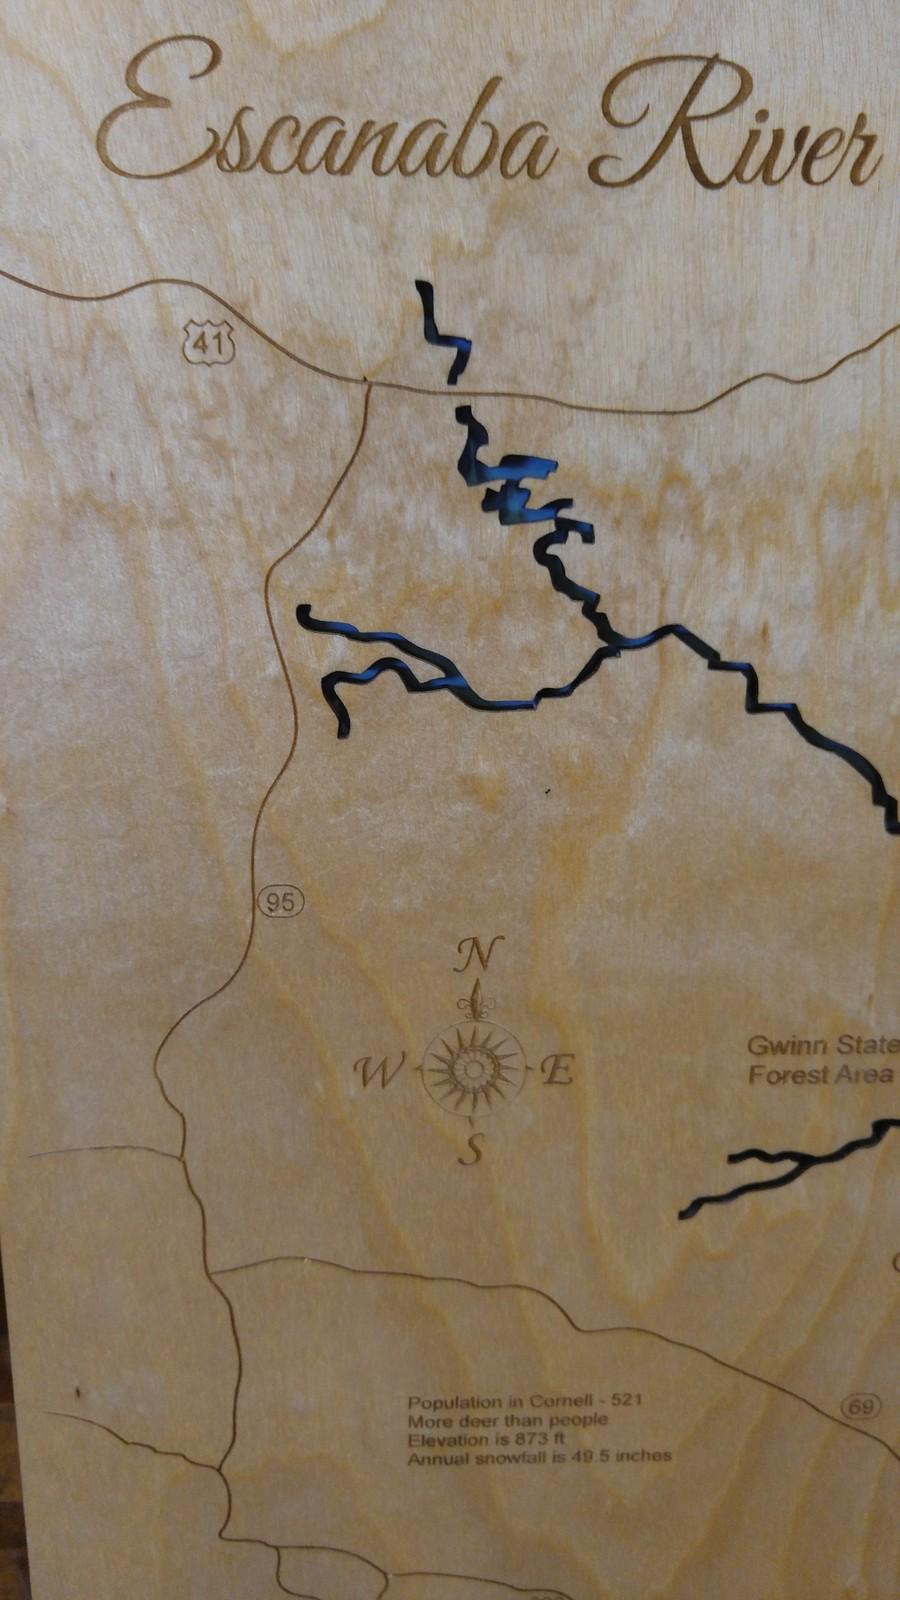 Escanaba River, Michigan - Wood Laser Cut Map - Wall Hanging